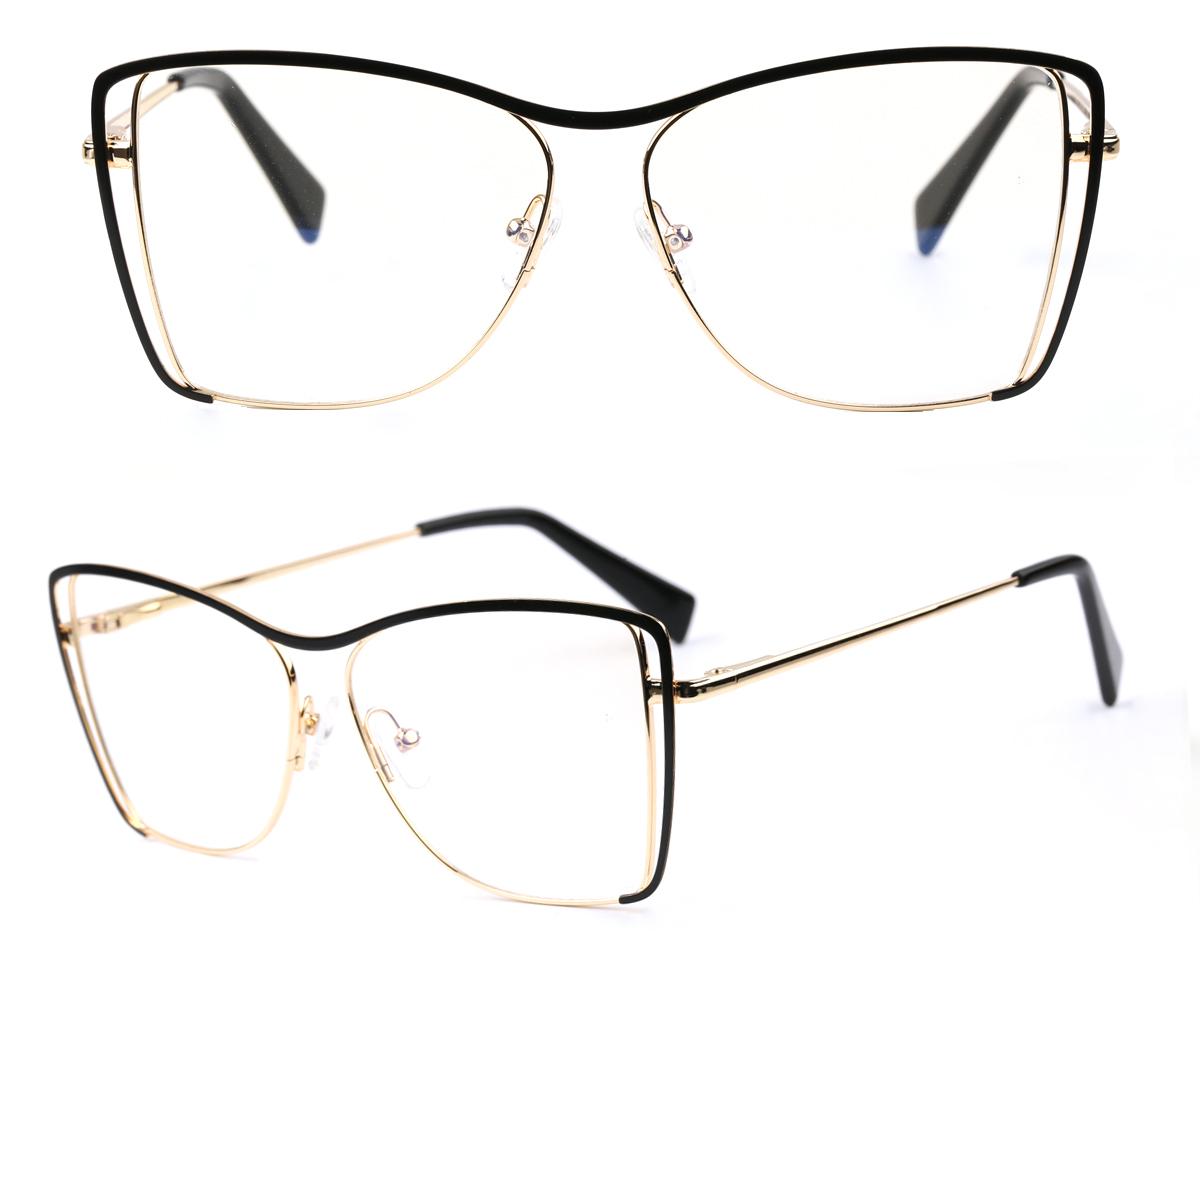 ODM/OEM Designer Acetate Optical Frames-Popeyewear